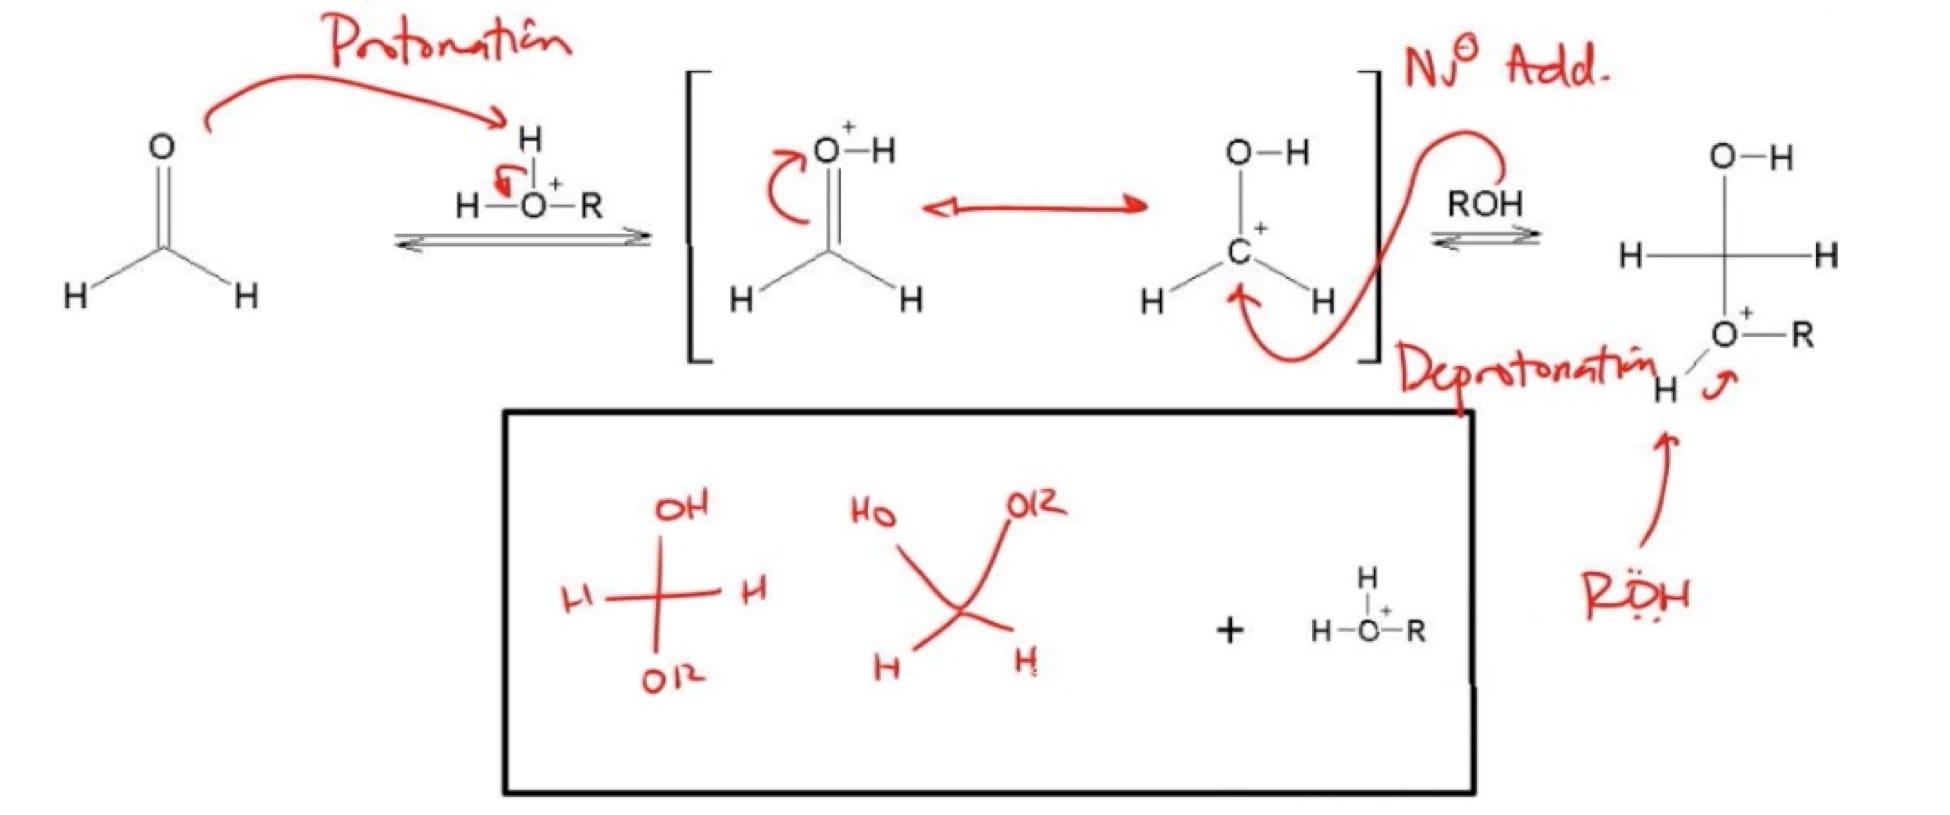 Hemiacetal mechanism